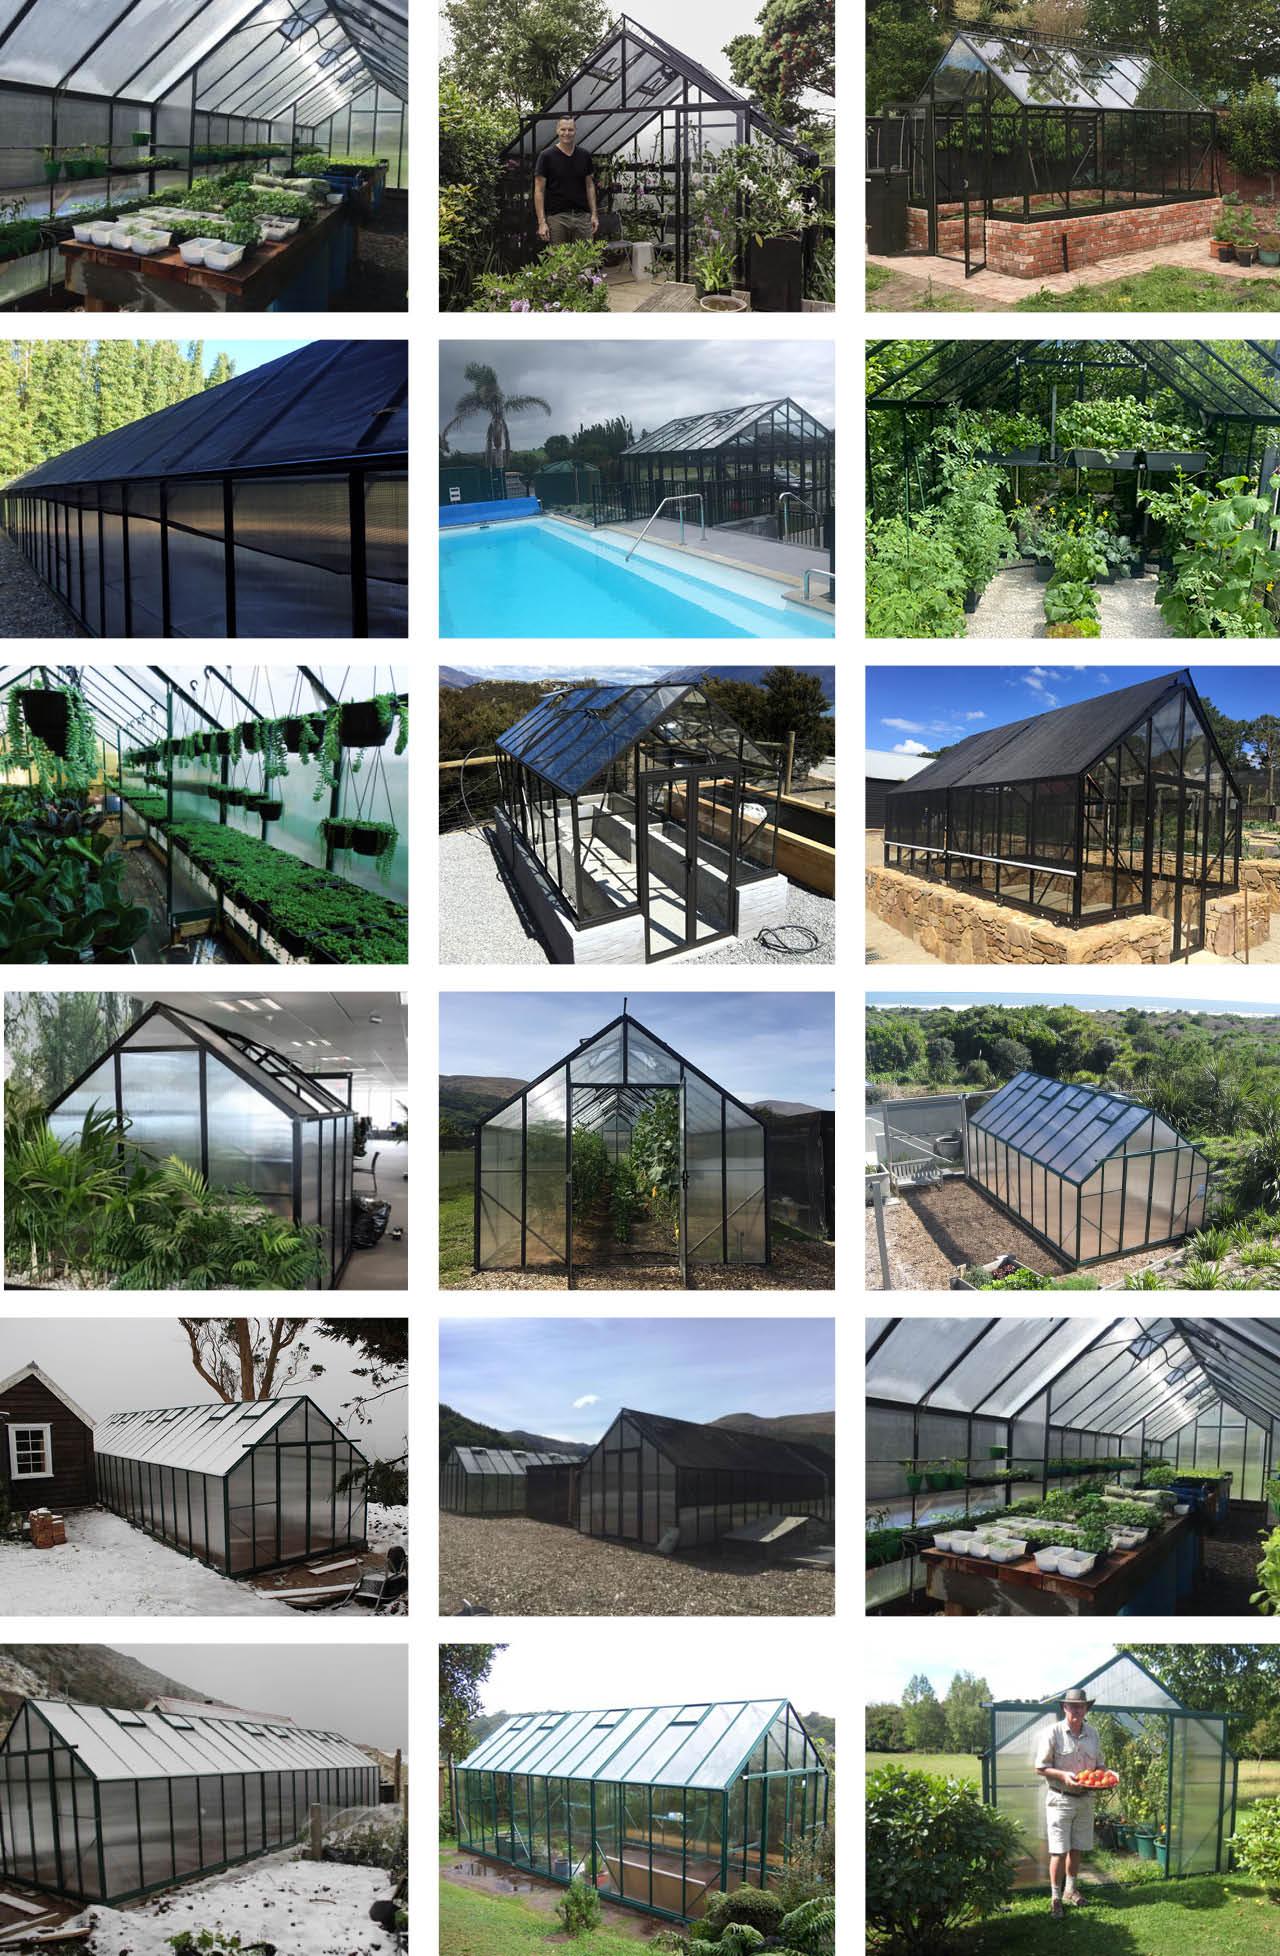 winter-gardenz-residential-gallery-2.jpg